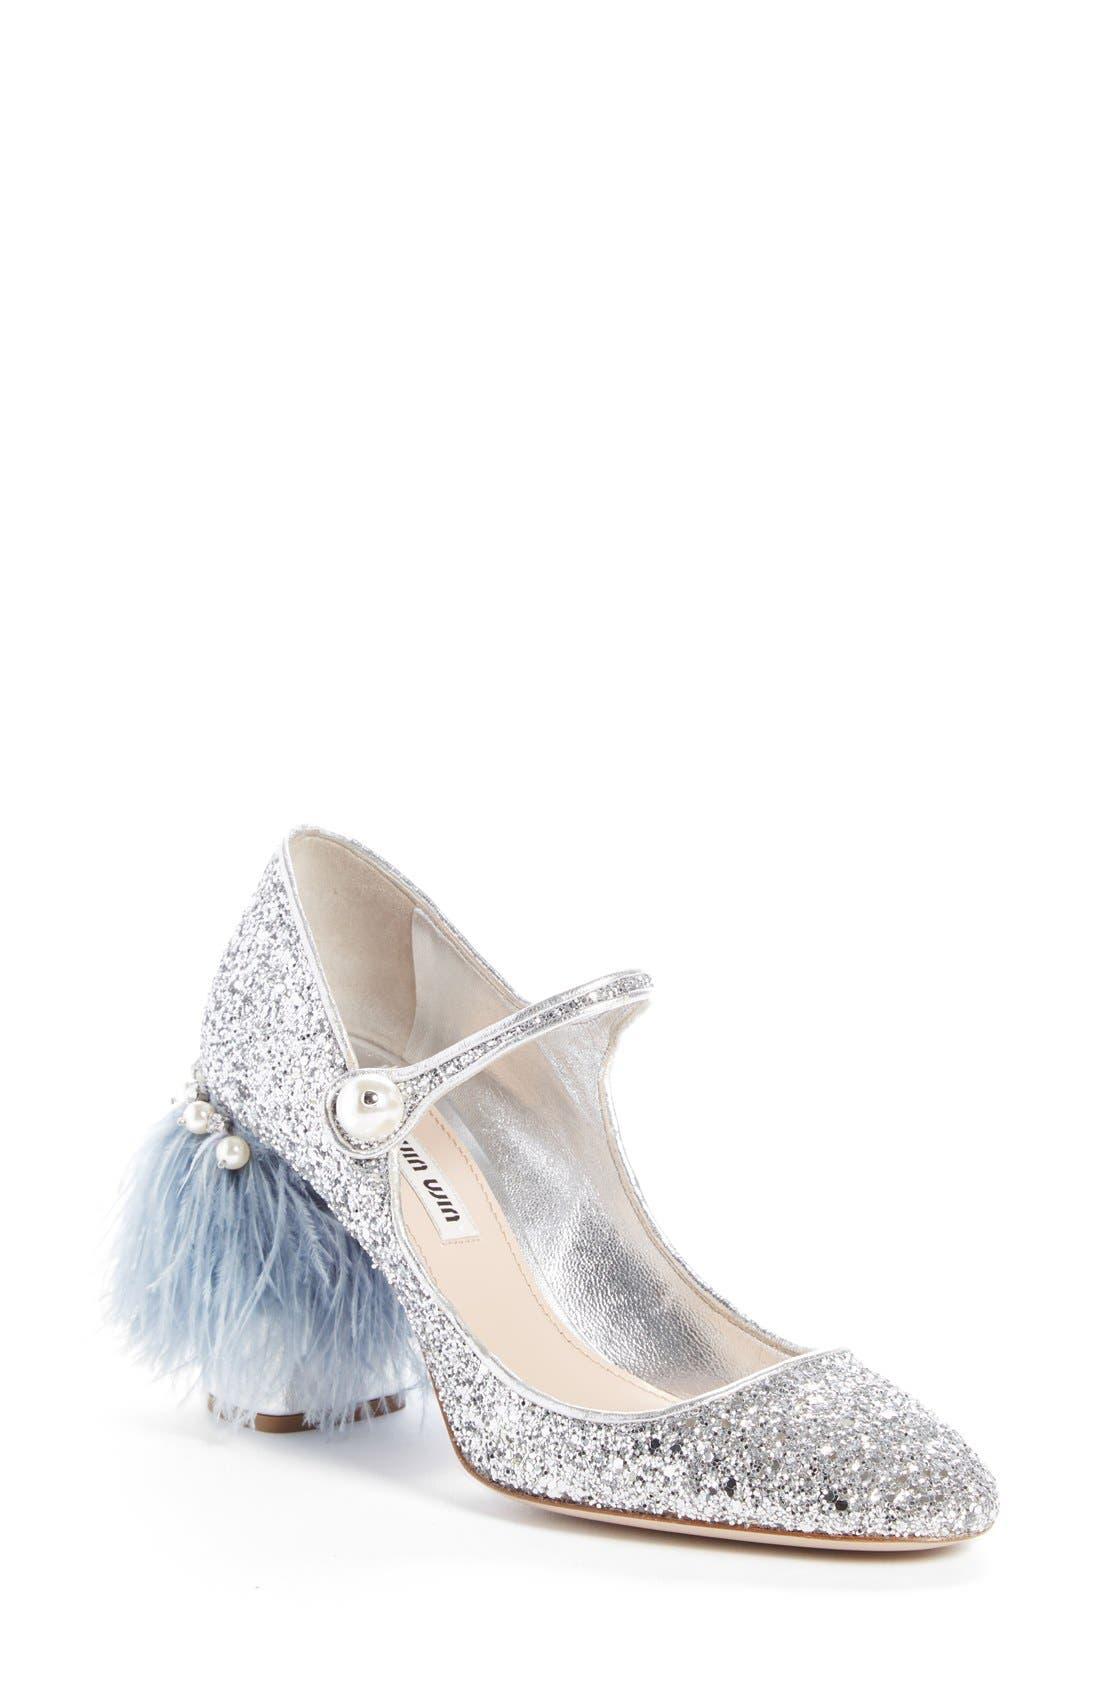 Alternate Image 1 Selected - Miu Miu Feather Block Heel Mary Jane Pump (Women)